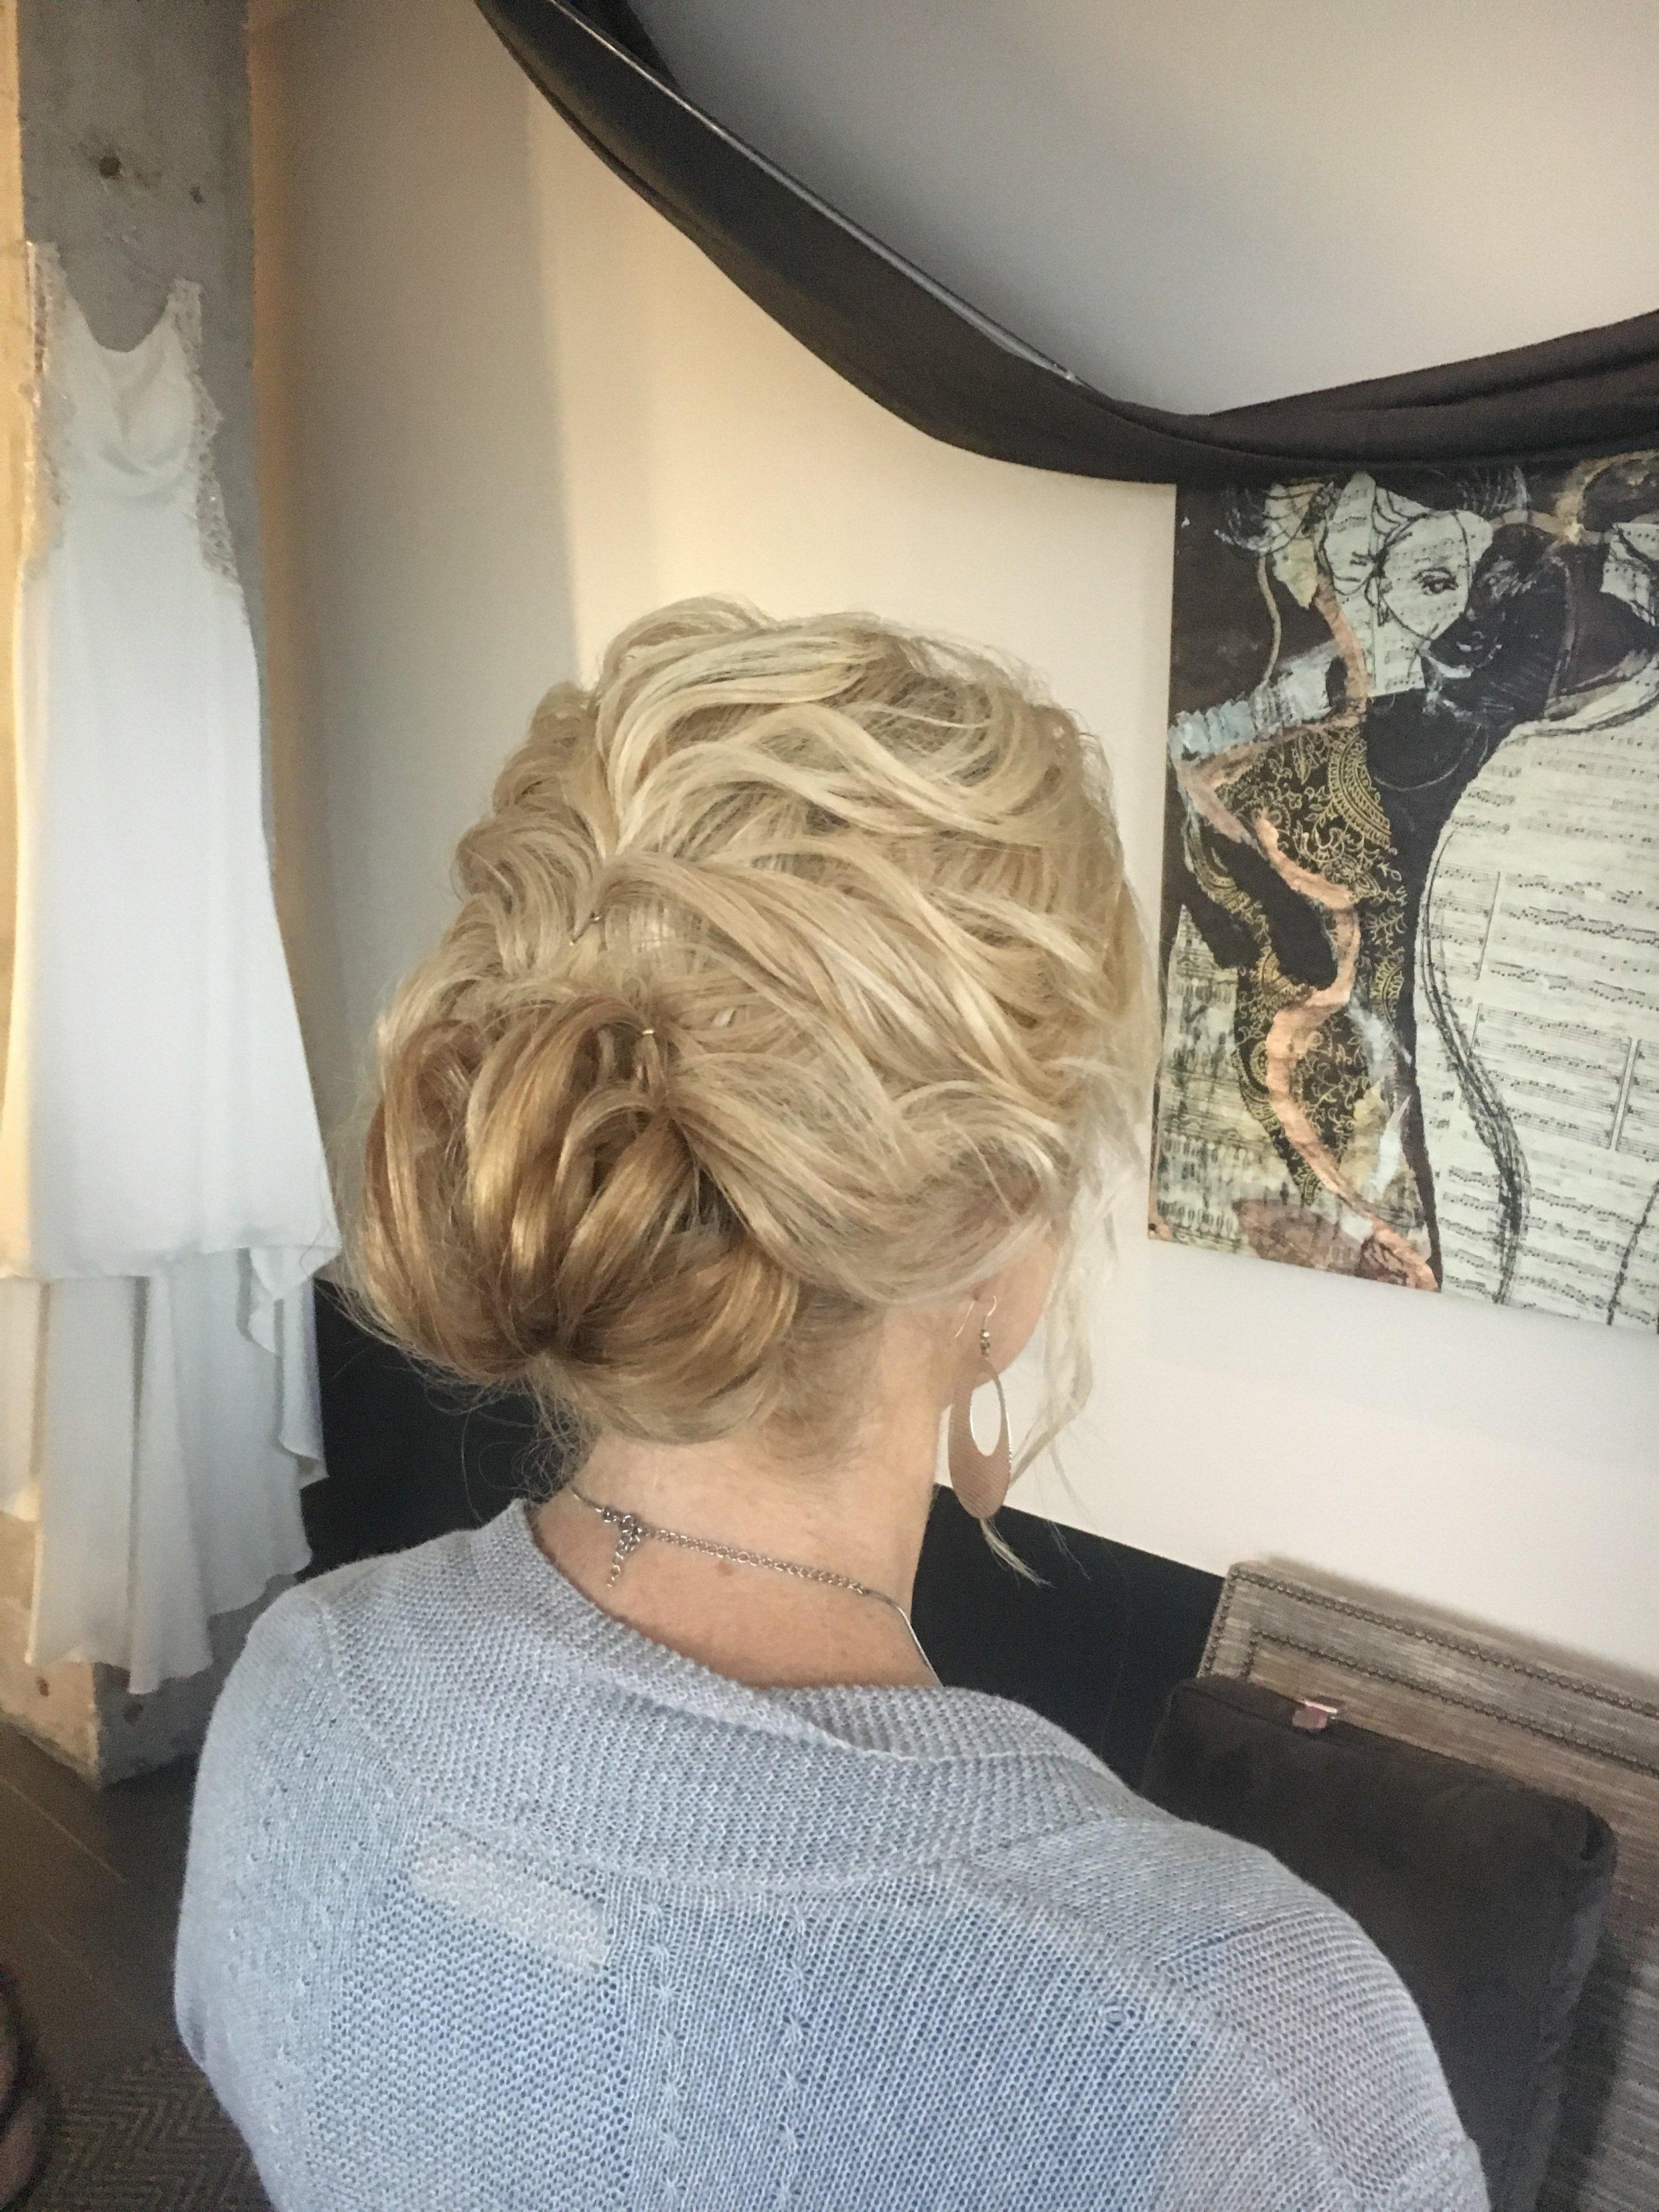 Karen Hair 08_26_2017 007.JPG